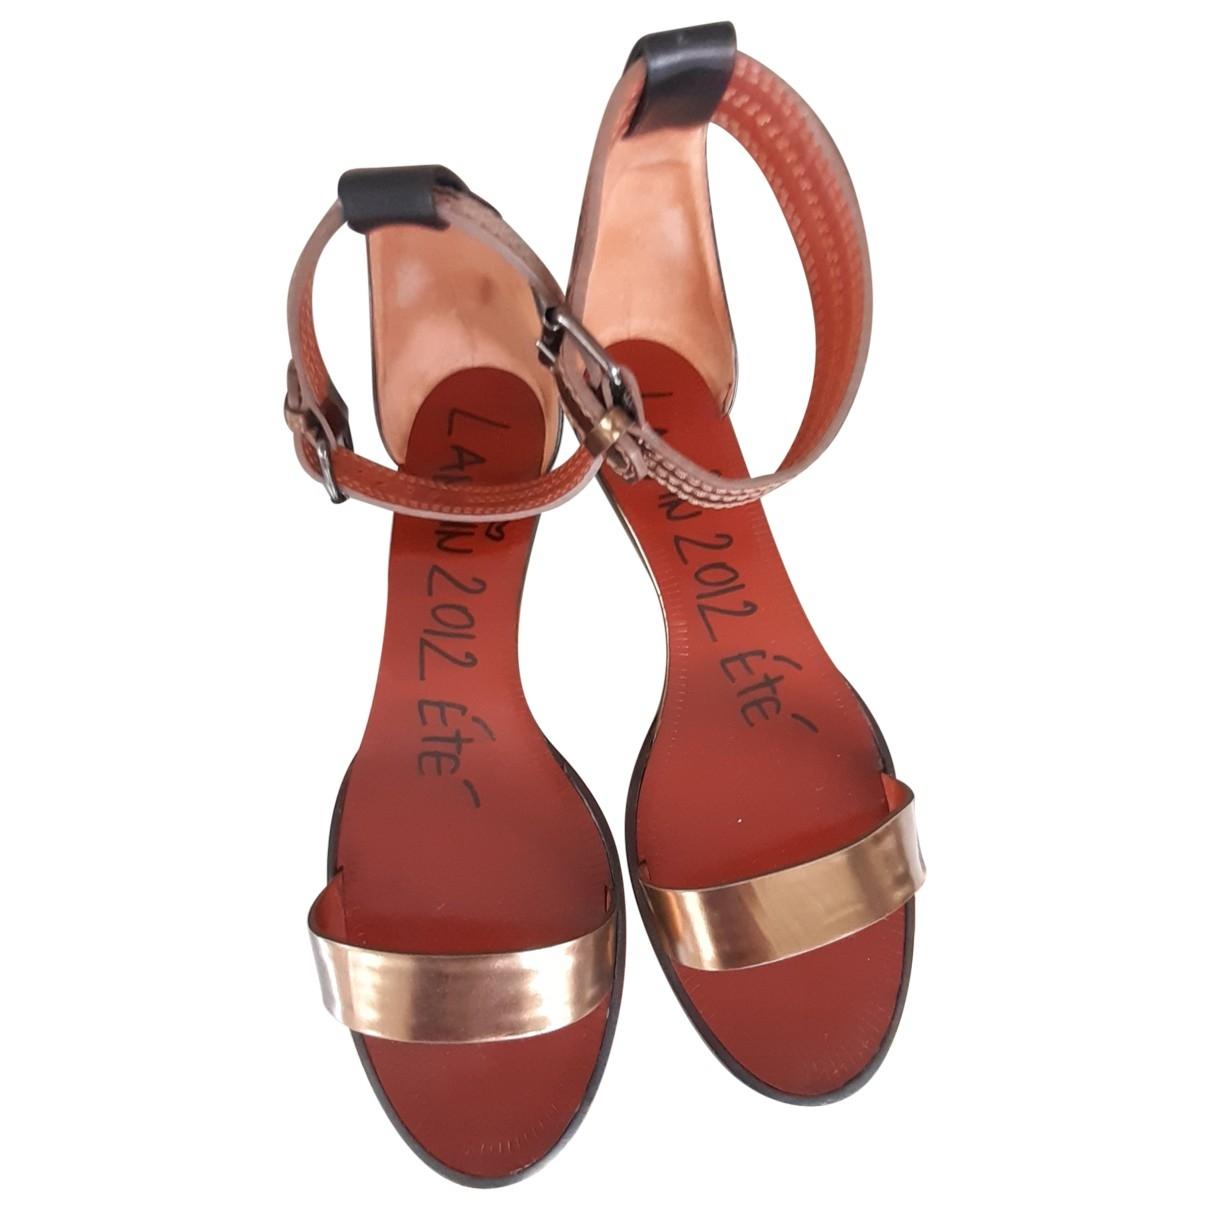 Lanvin \N Metallic Leather Sandals for Women 38 EU